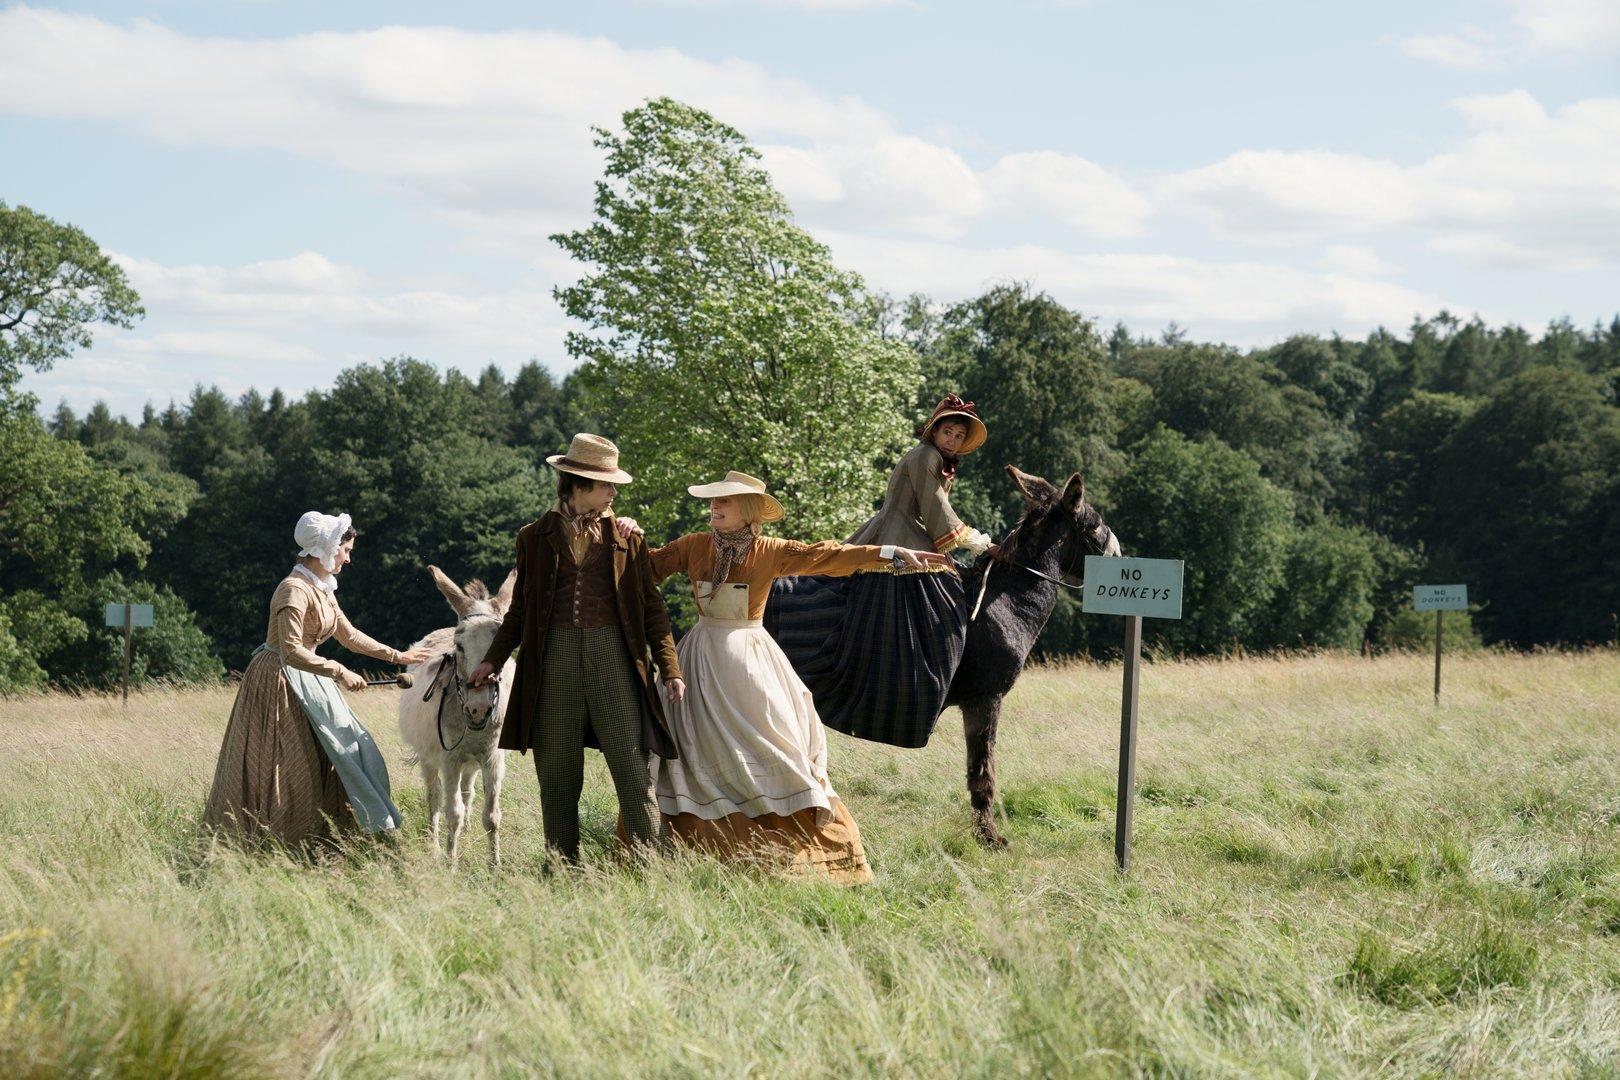 Verfilmung des Dickens-Klassikers: Happy End mit Esel